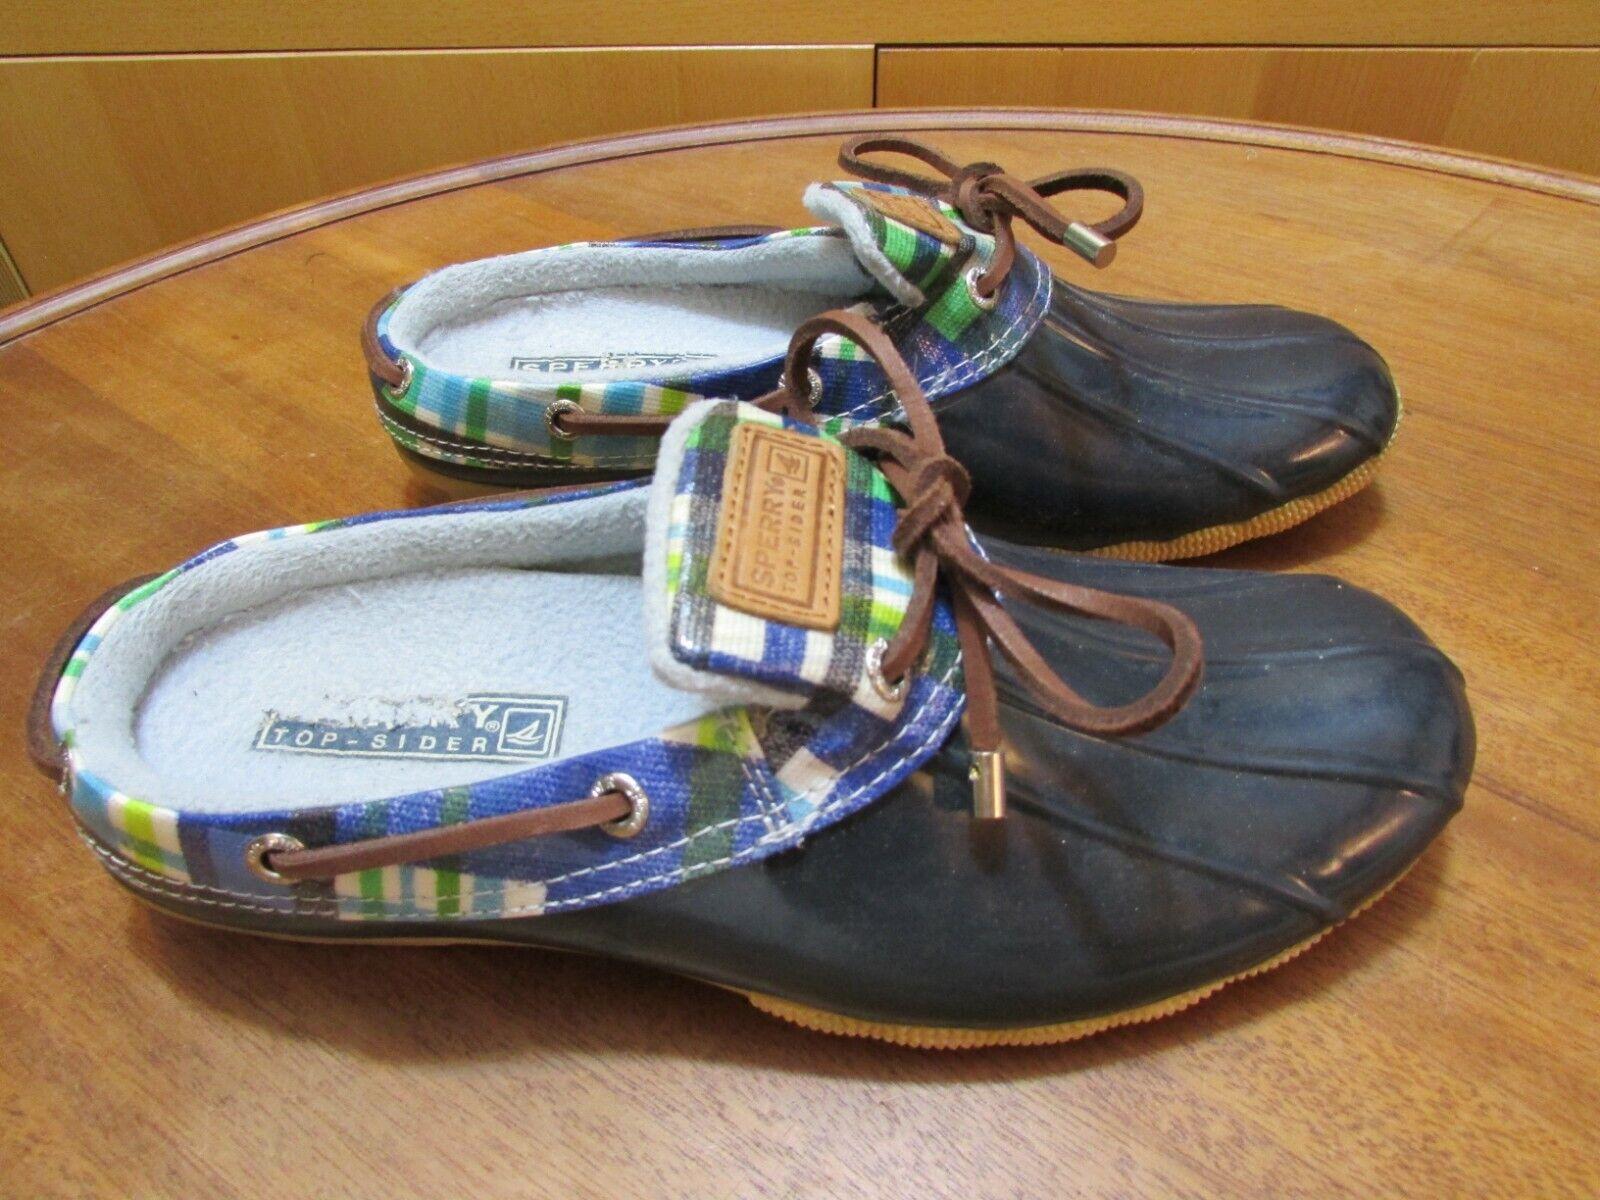 SPERRY TOP-SIDER Women's 7.5 Navy Blue Waterproof Rubber Boot Slip-On Shoes